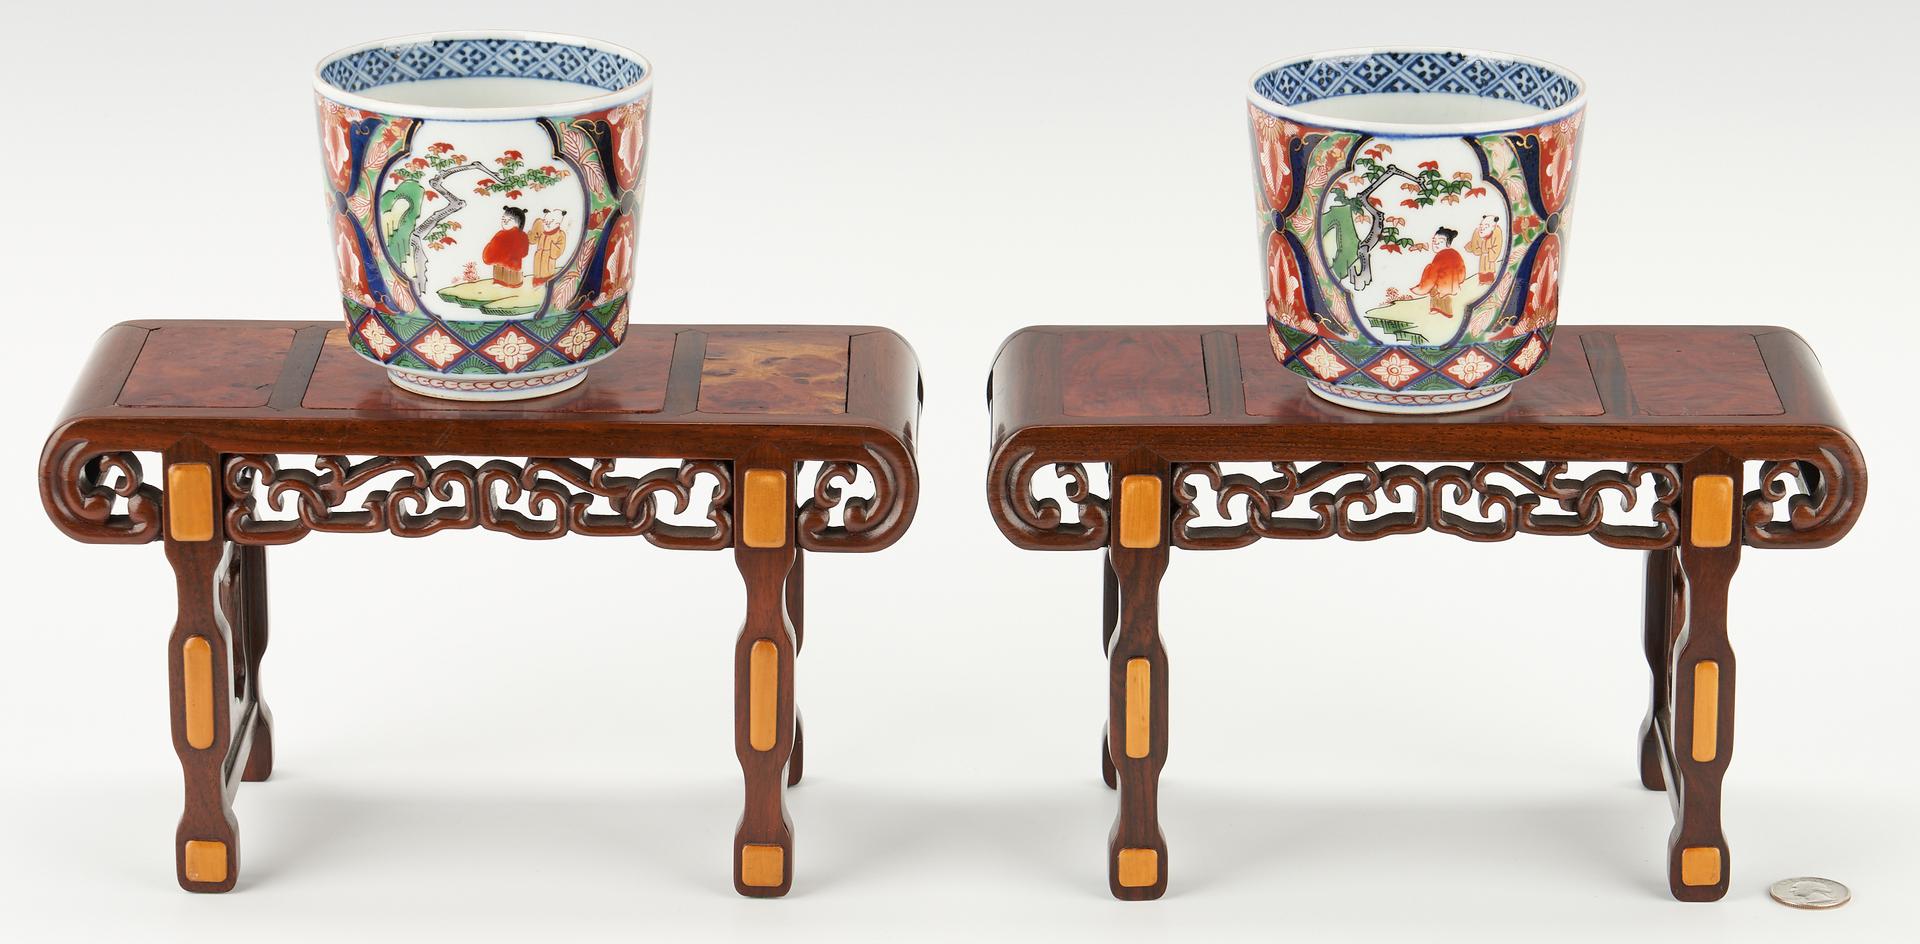 Lot 429: 11 Asian Decorative Items incl. Porcelain Charger, most Imari